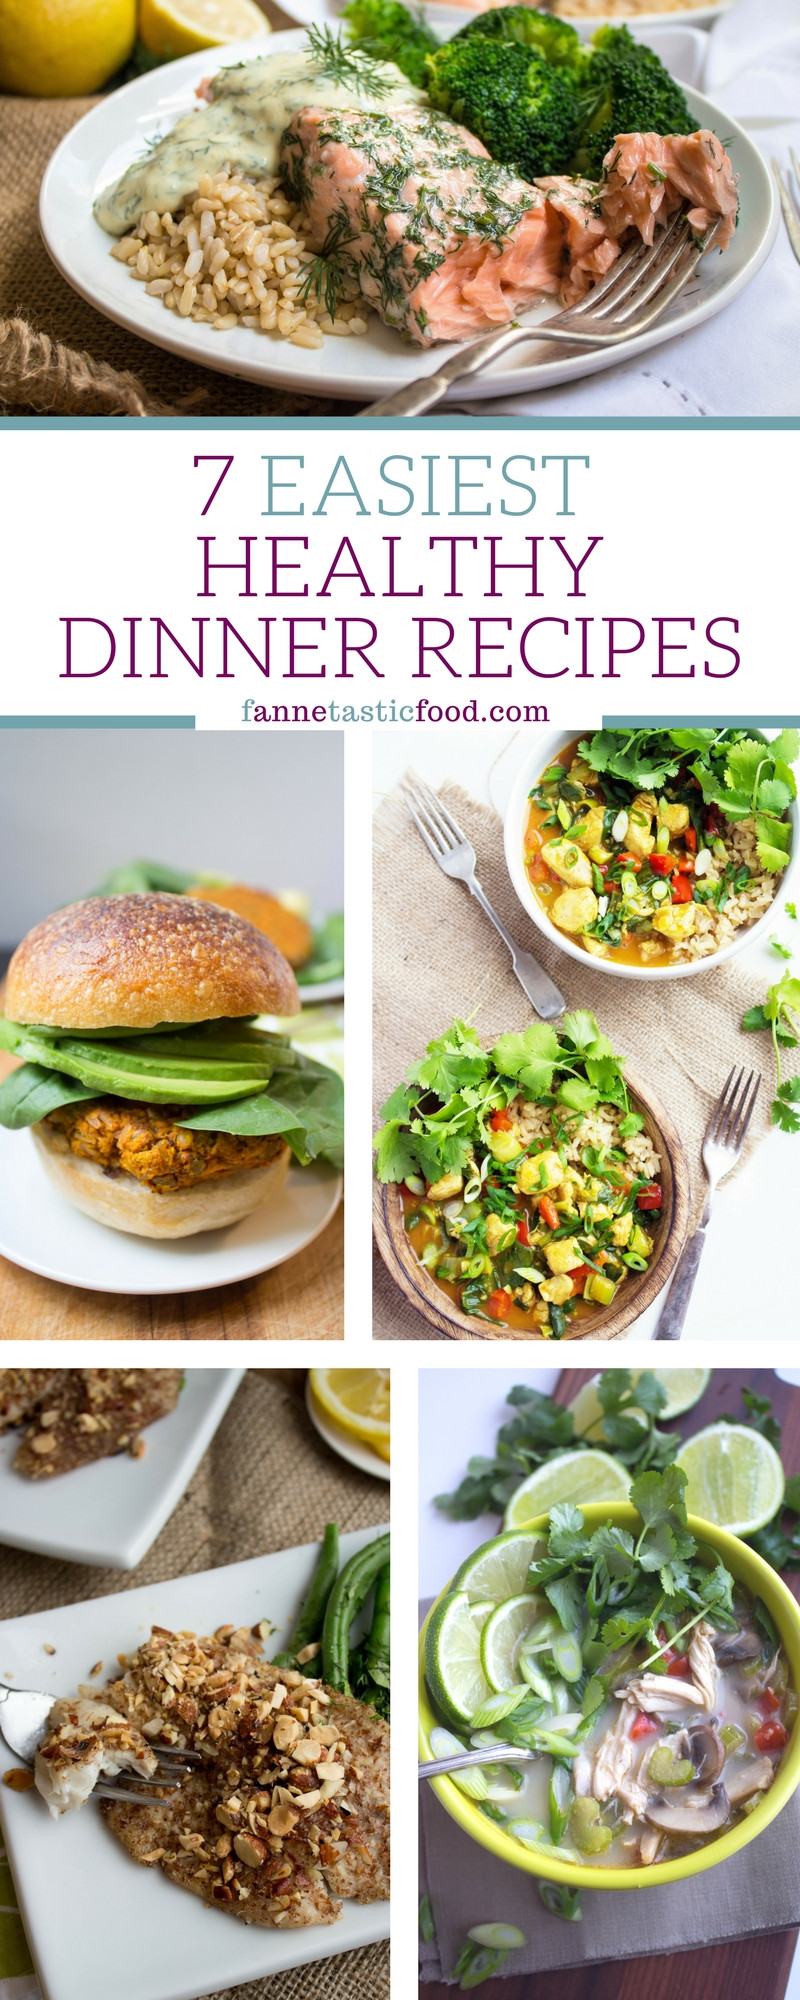 Easy Healthy Dinner Recipes  Really easy healthy dinner recipes Food easy recipes